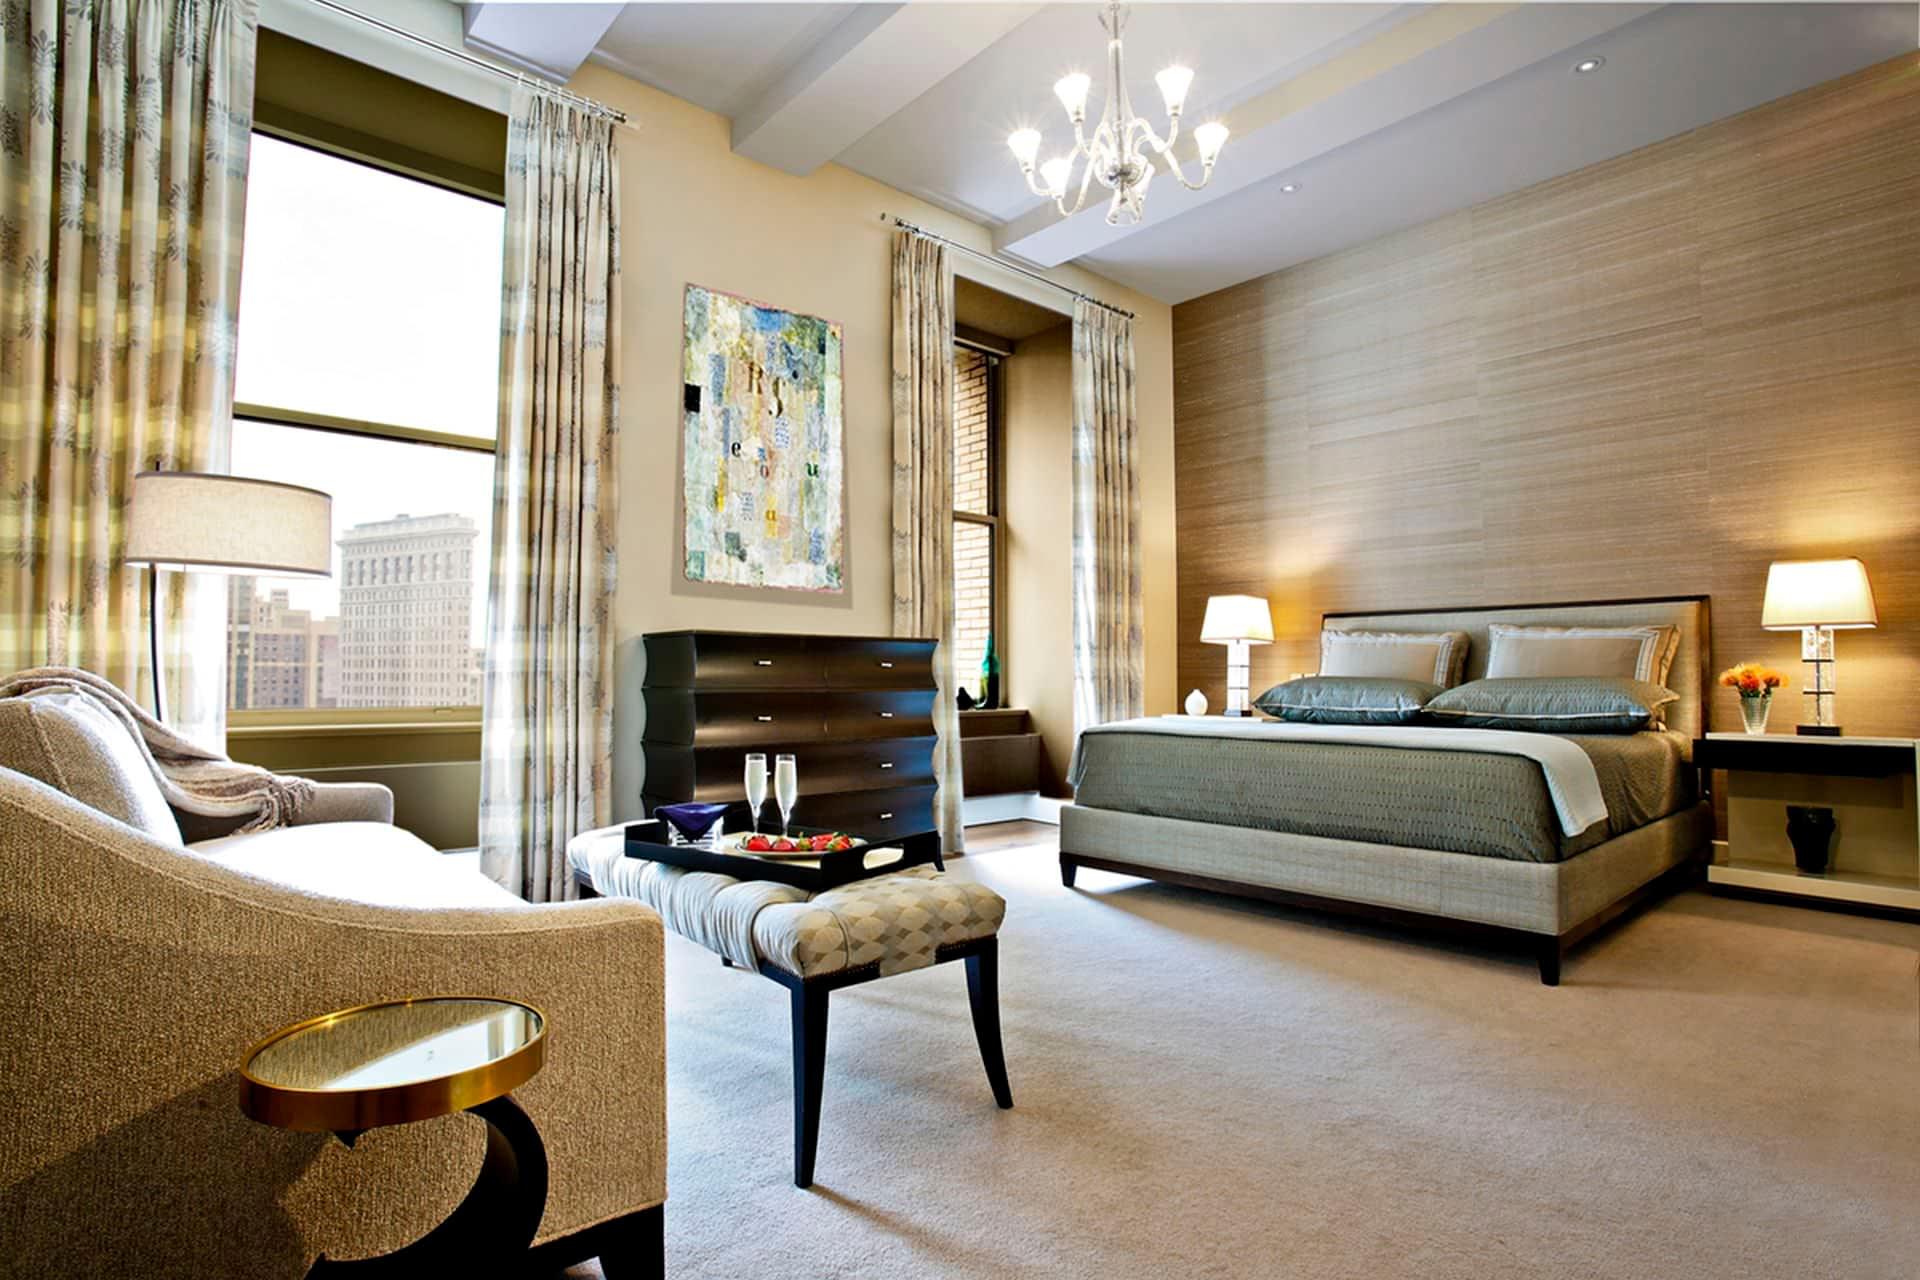 resort style bedroom by hubley design interiors